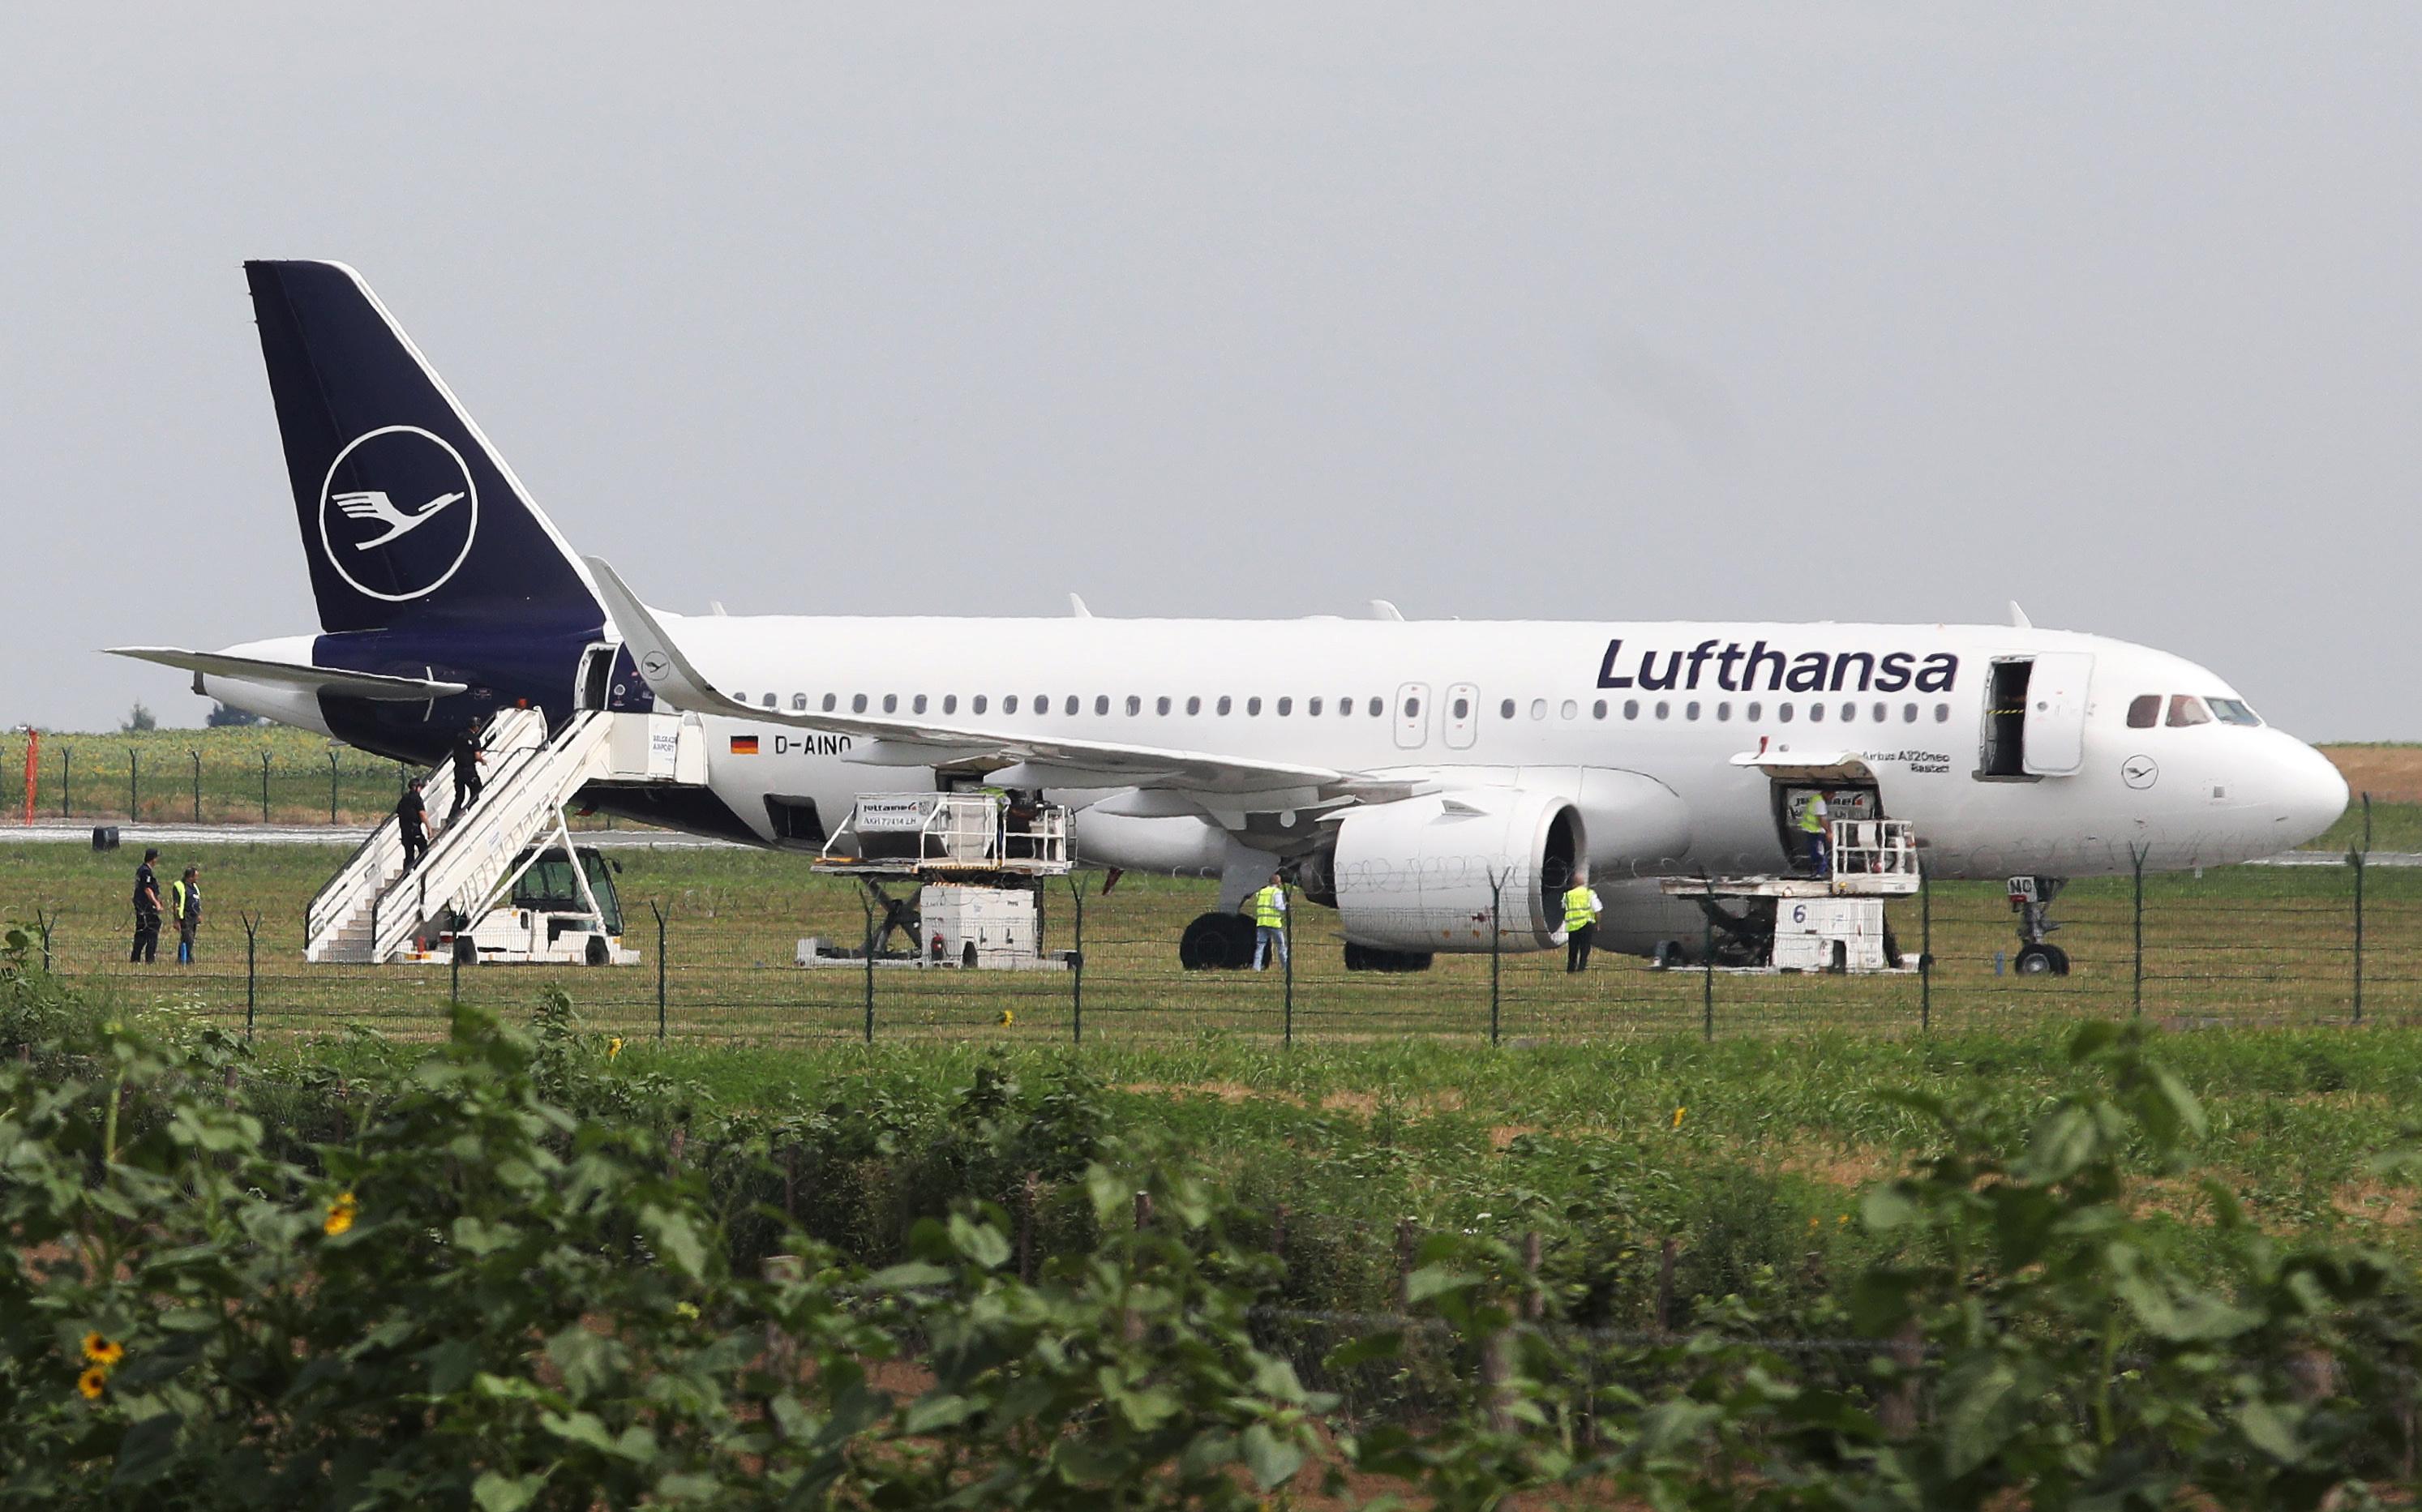 Serbian interior ministry says Lufthansa bomb threat was fake